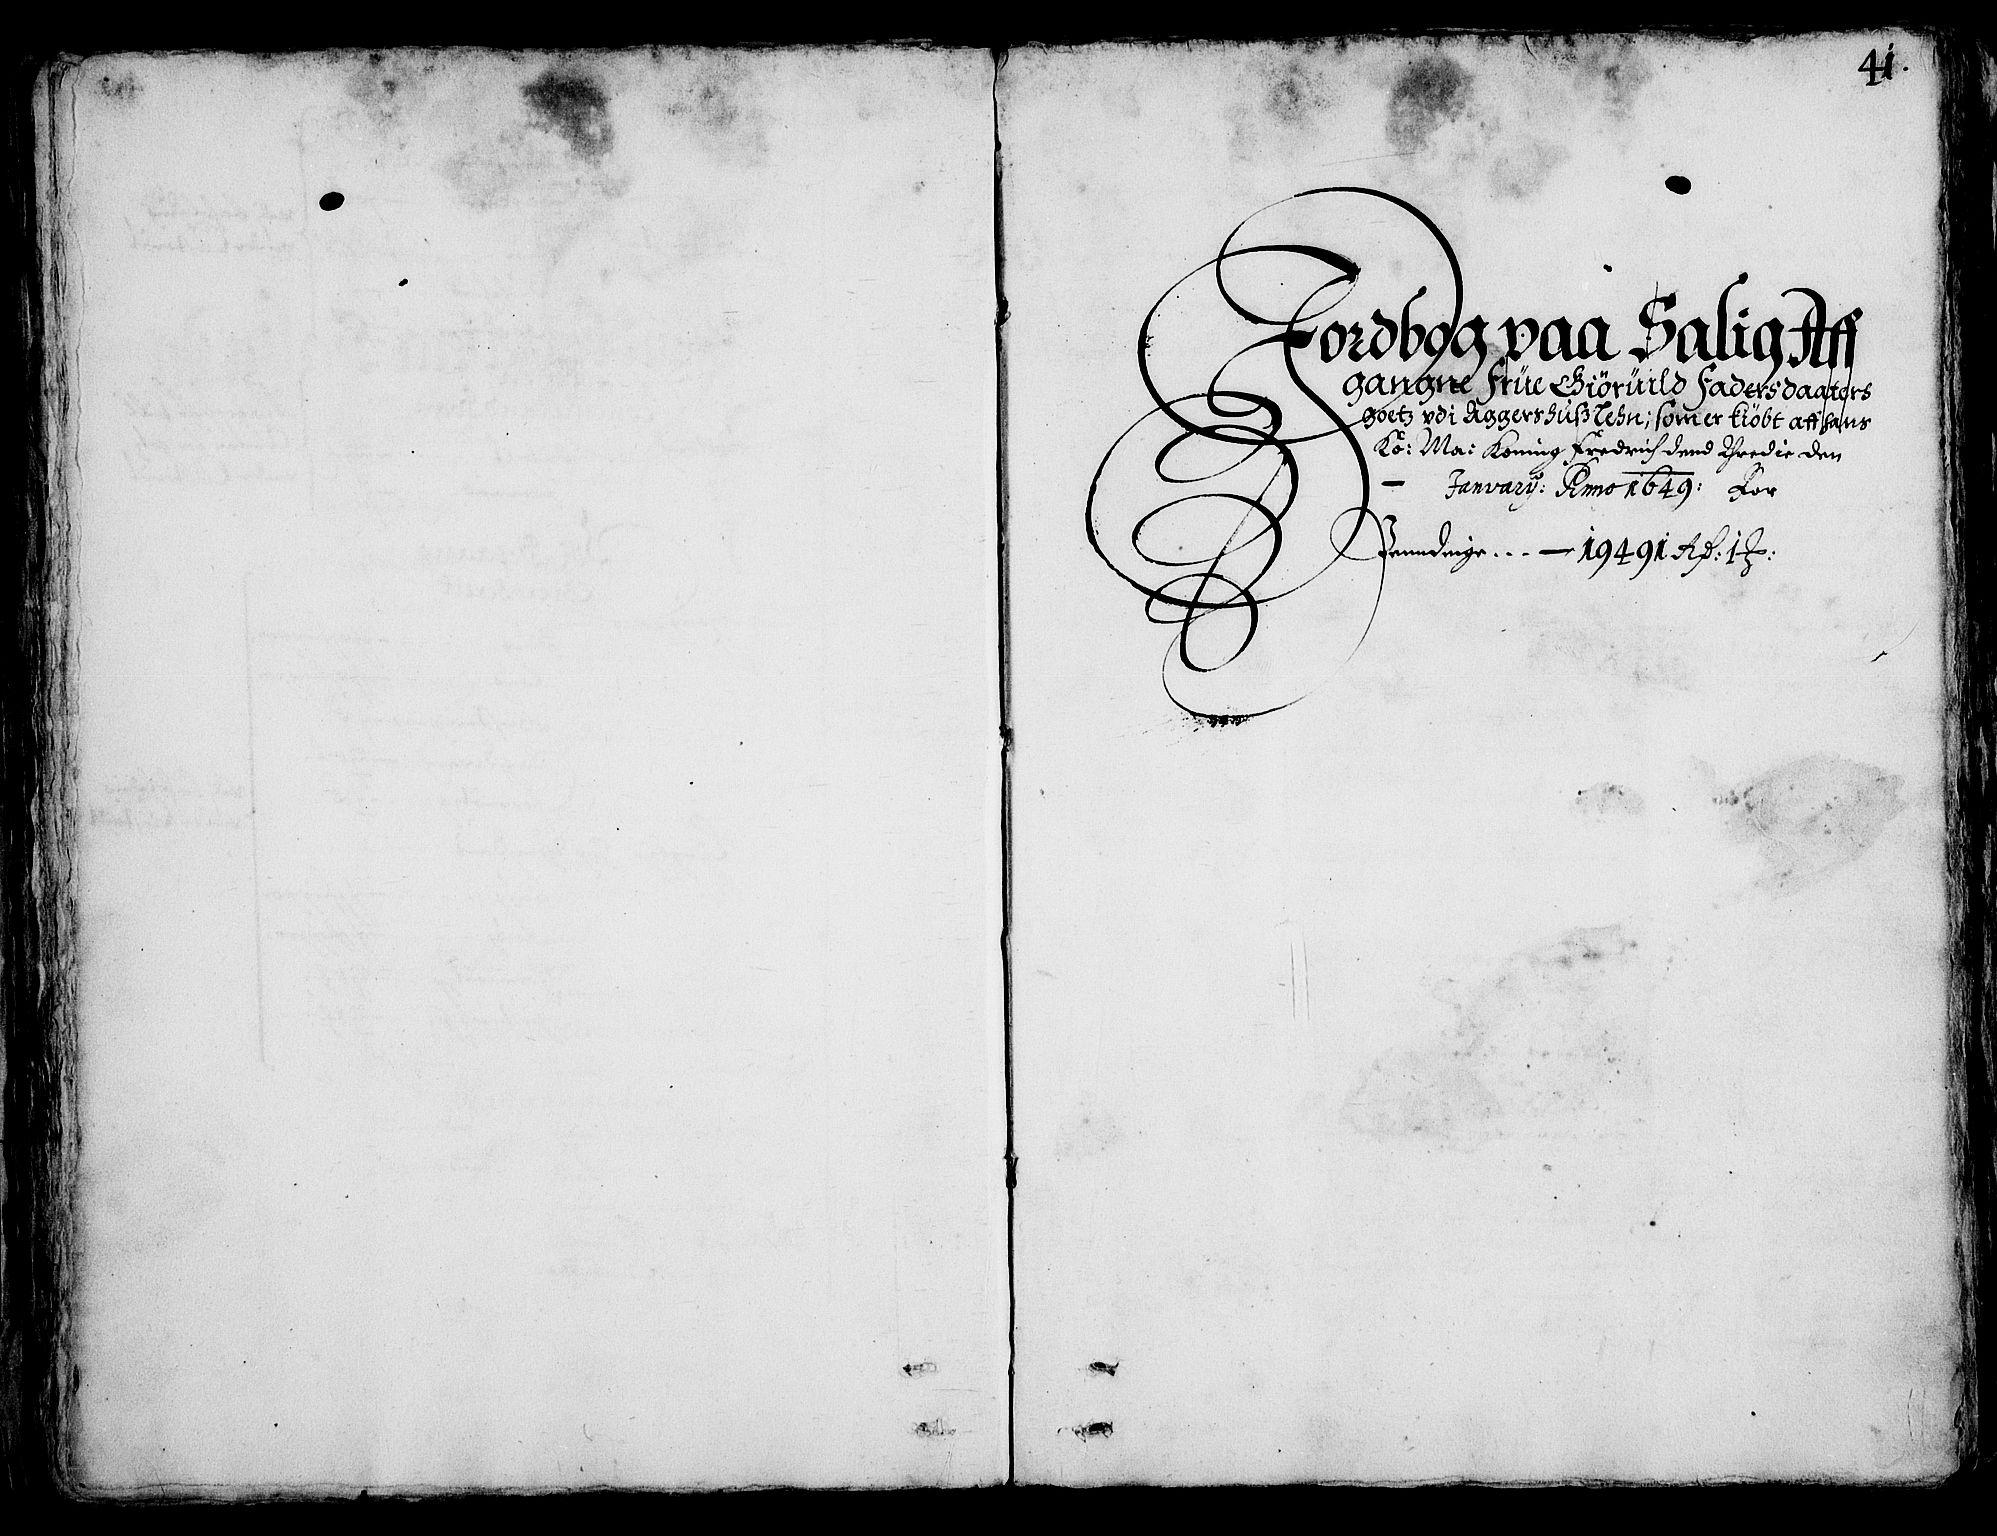 RA, Rentekammeret inntil 1814, Realistisk ordnet avdeling, On/L0001: Statens gods, 1651, s. 40b-41a